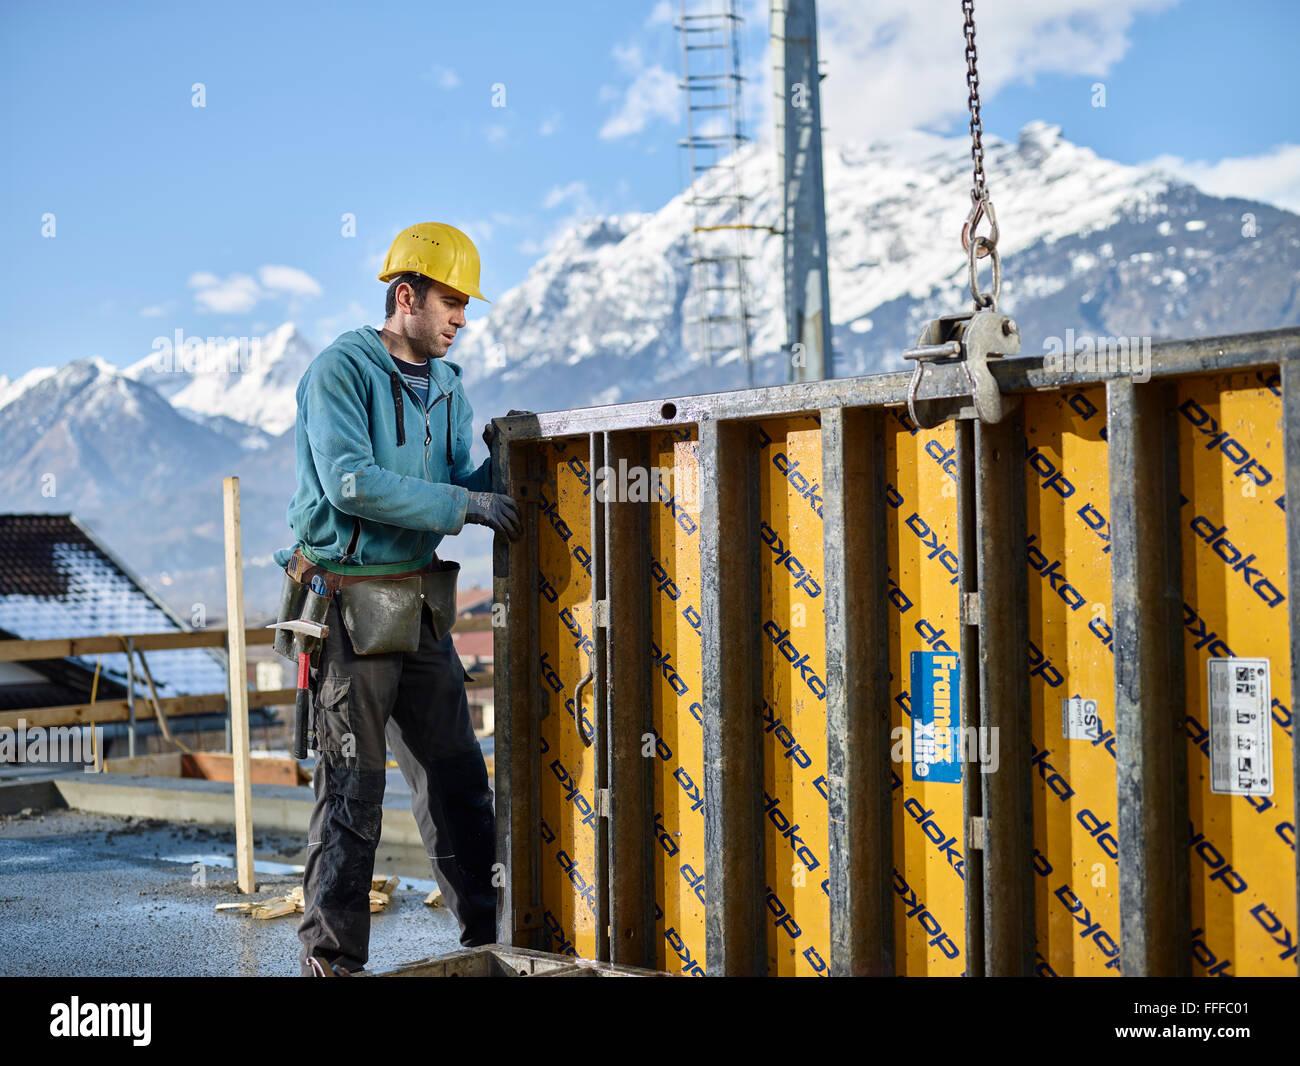 Construction worker lifting shuttering wall with crane, preparing framed formwork, Kolsass, Innsbruck Land, Tyrol, - Stock Image